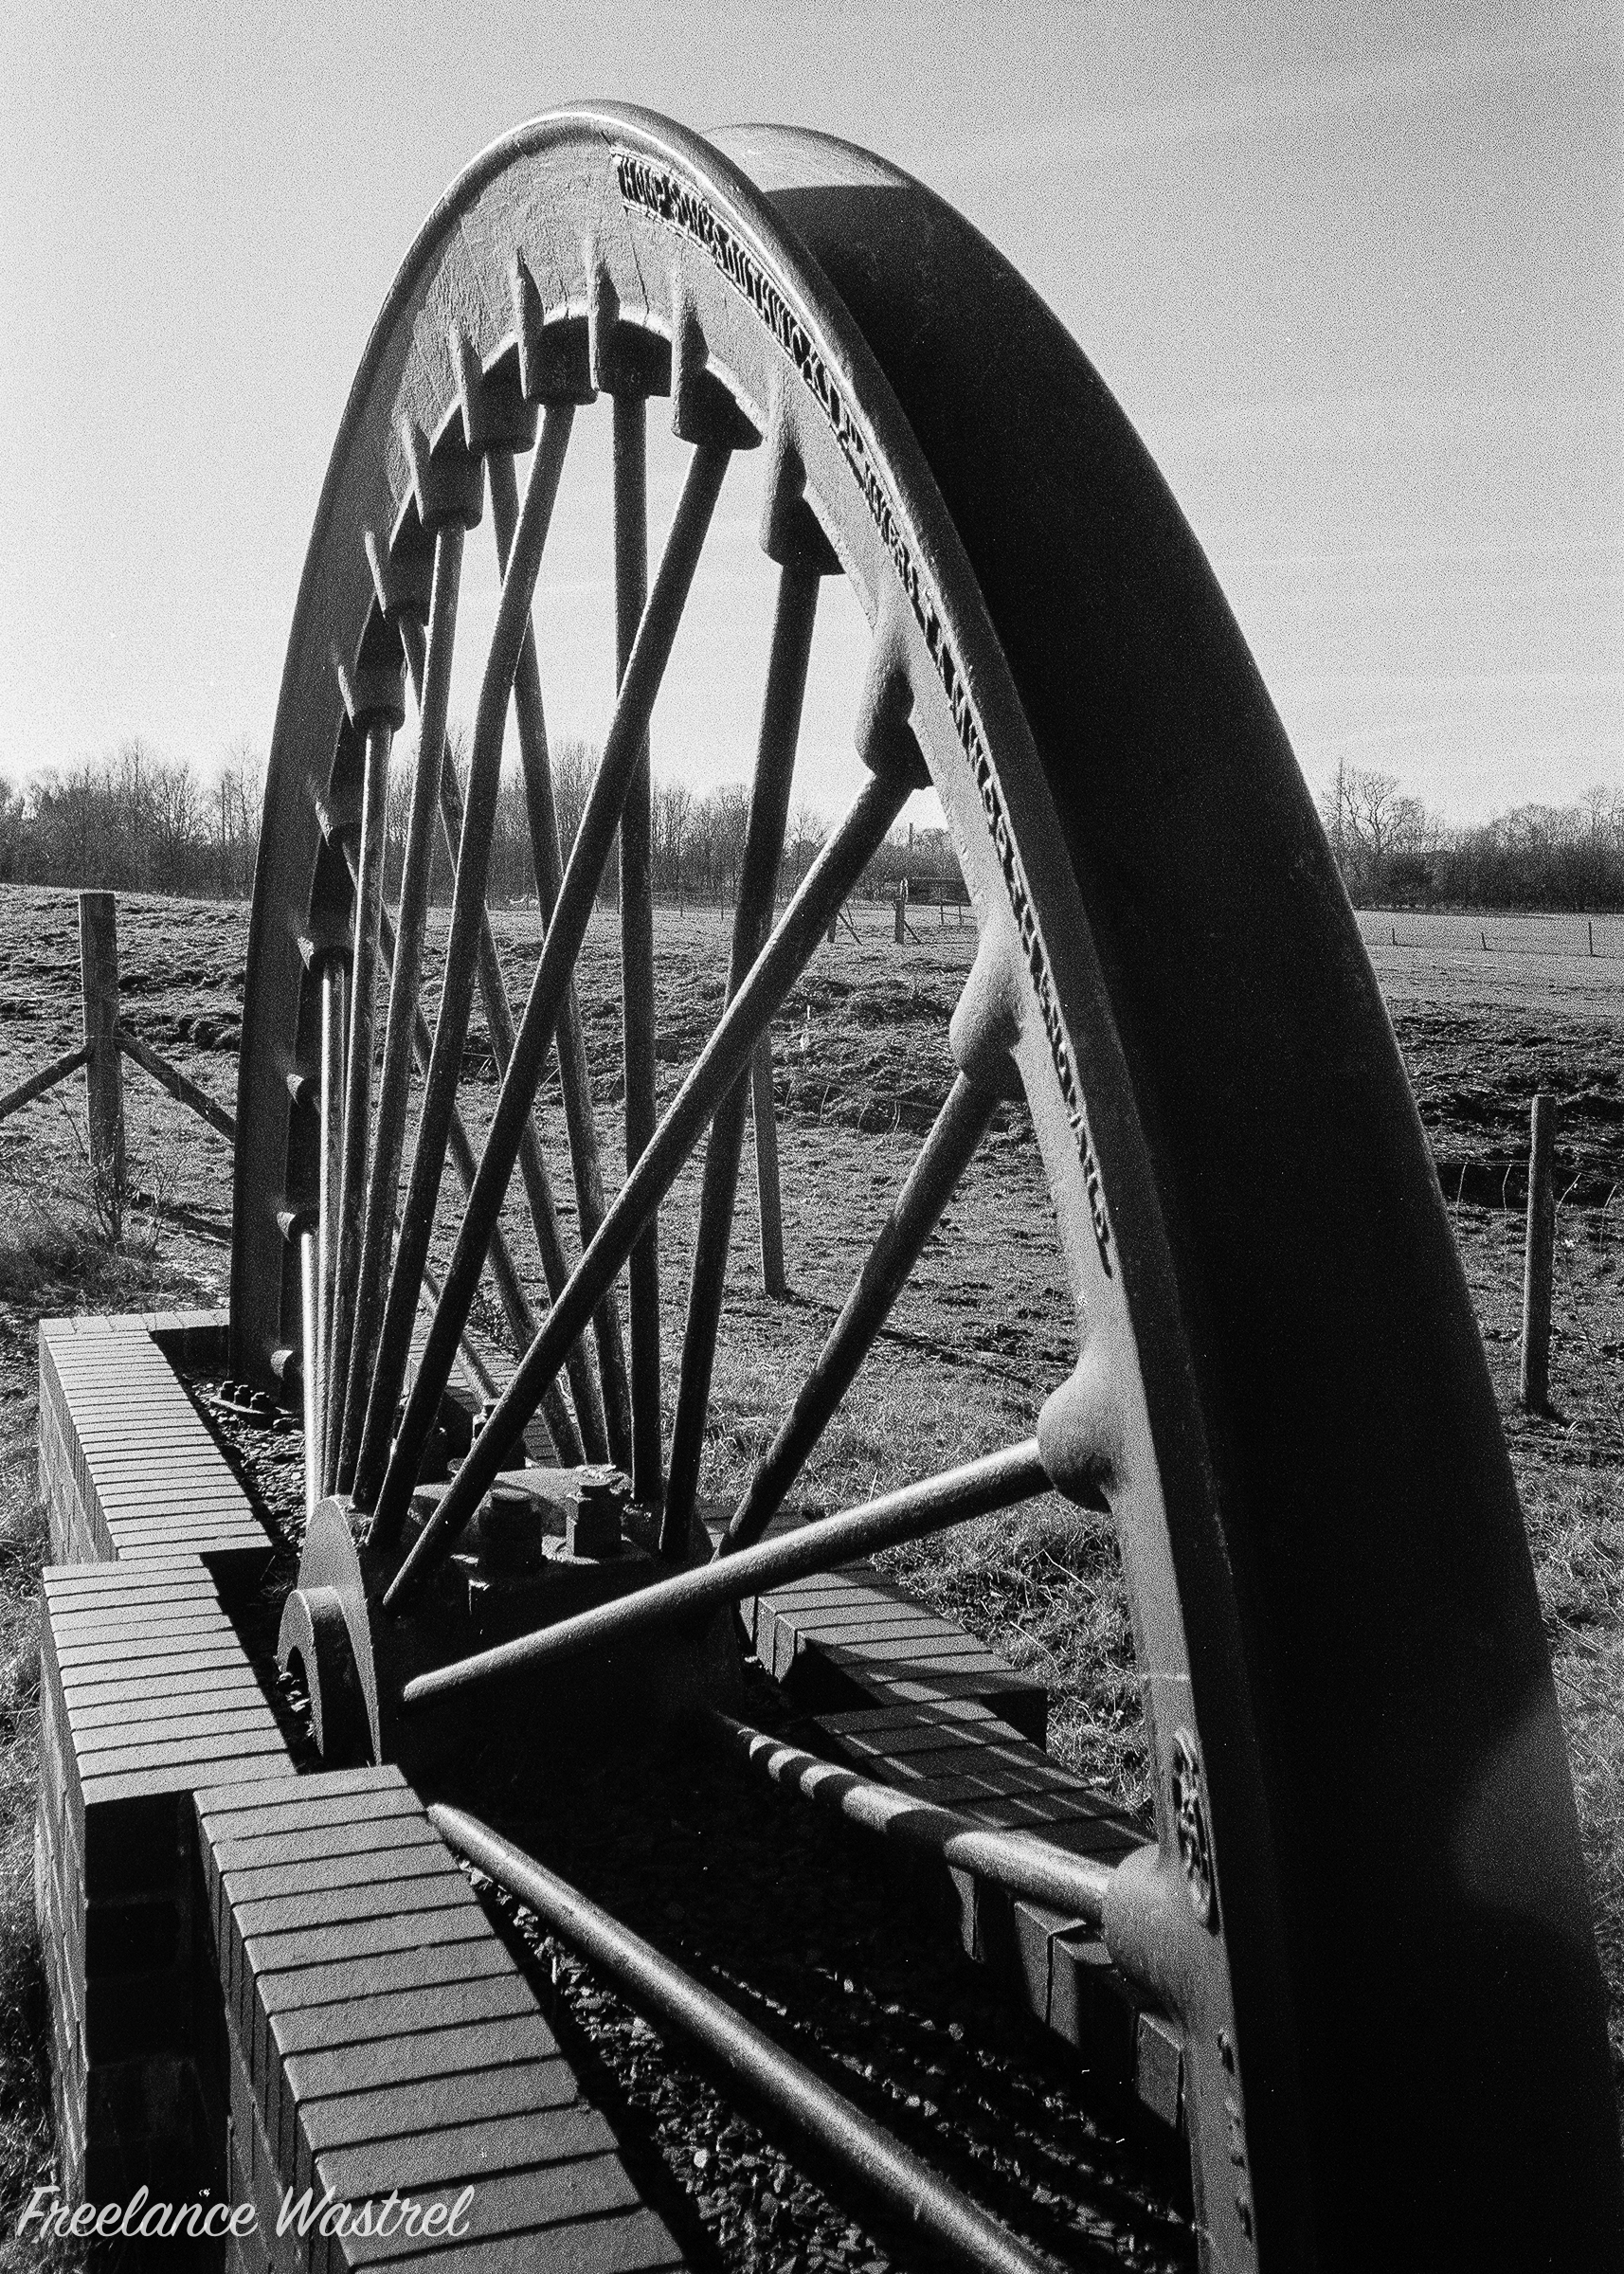 Pit Wheel, February 2018